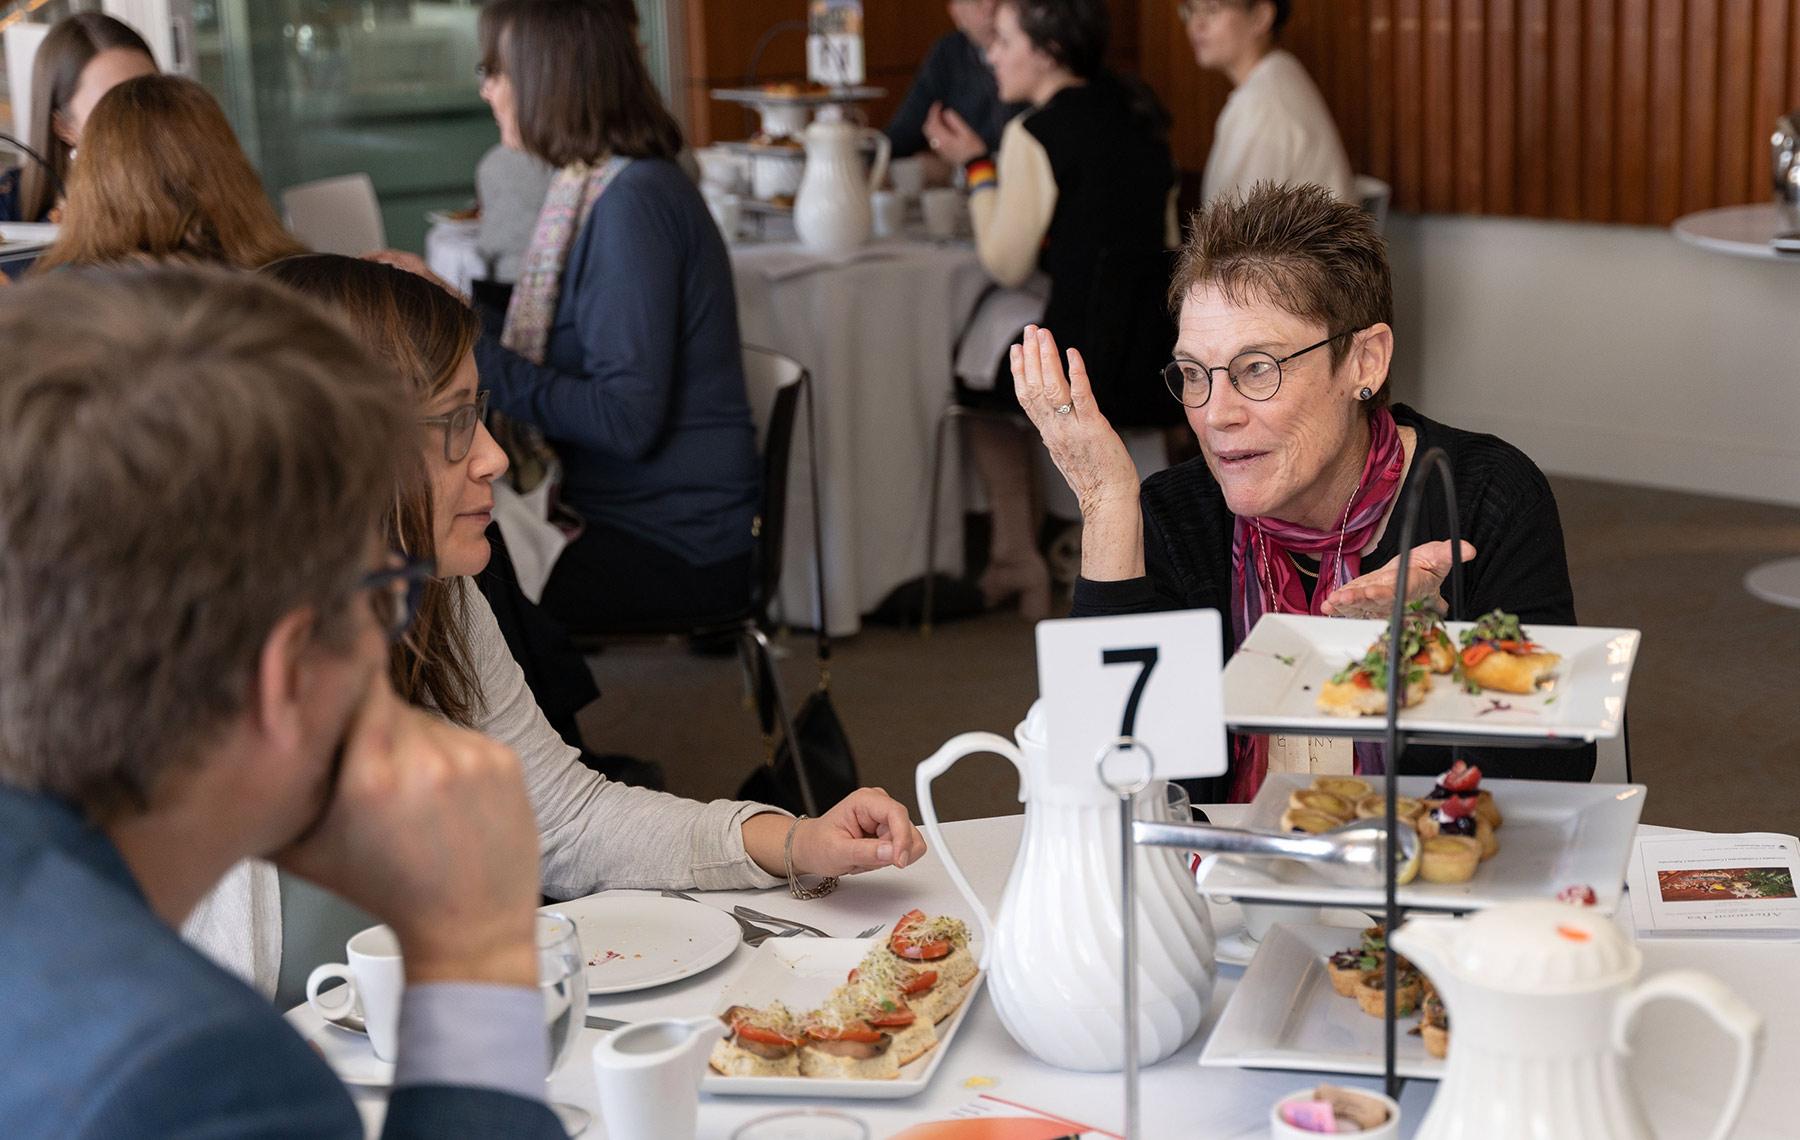 https://www.arts.ubc.ca/wp-content/uploads/sites/24/2020/03/20.03.09-Public-Humanities-Afternoon-Tea-Launch-04254-web.jpg